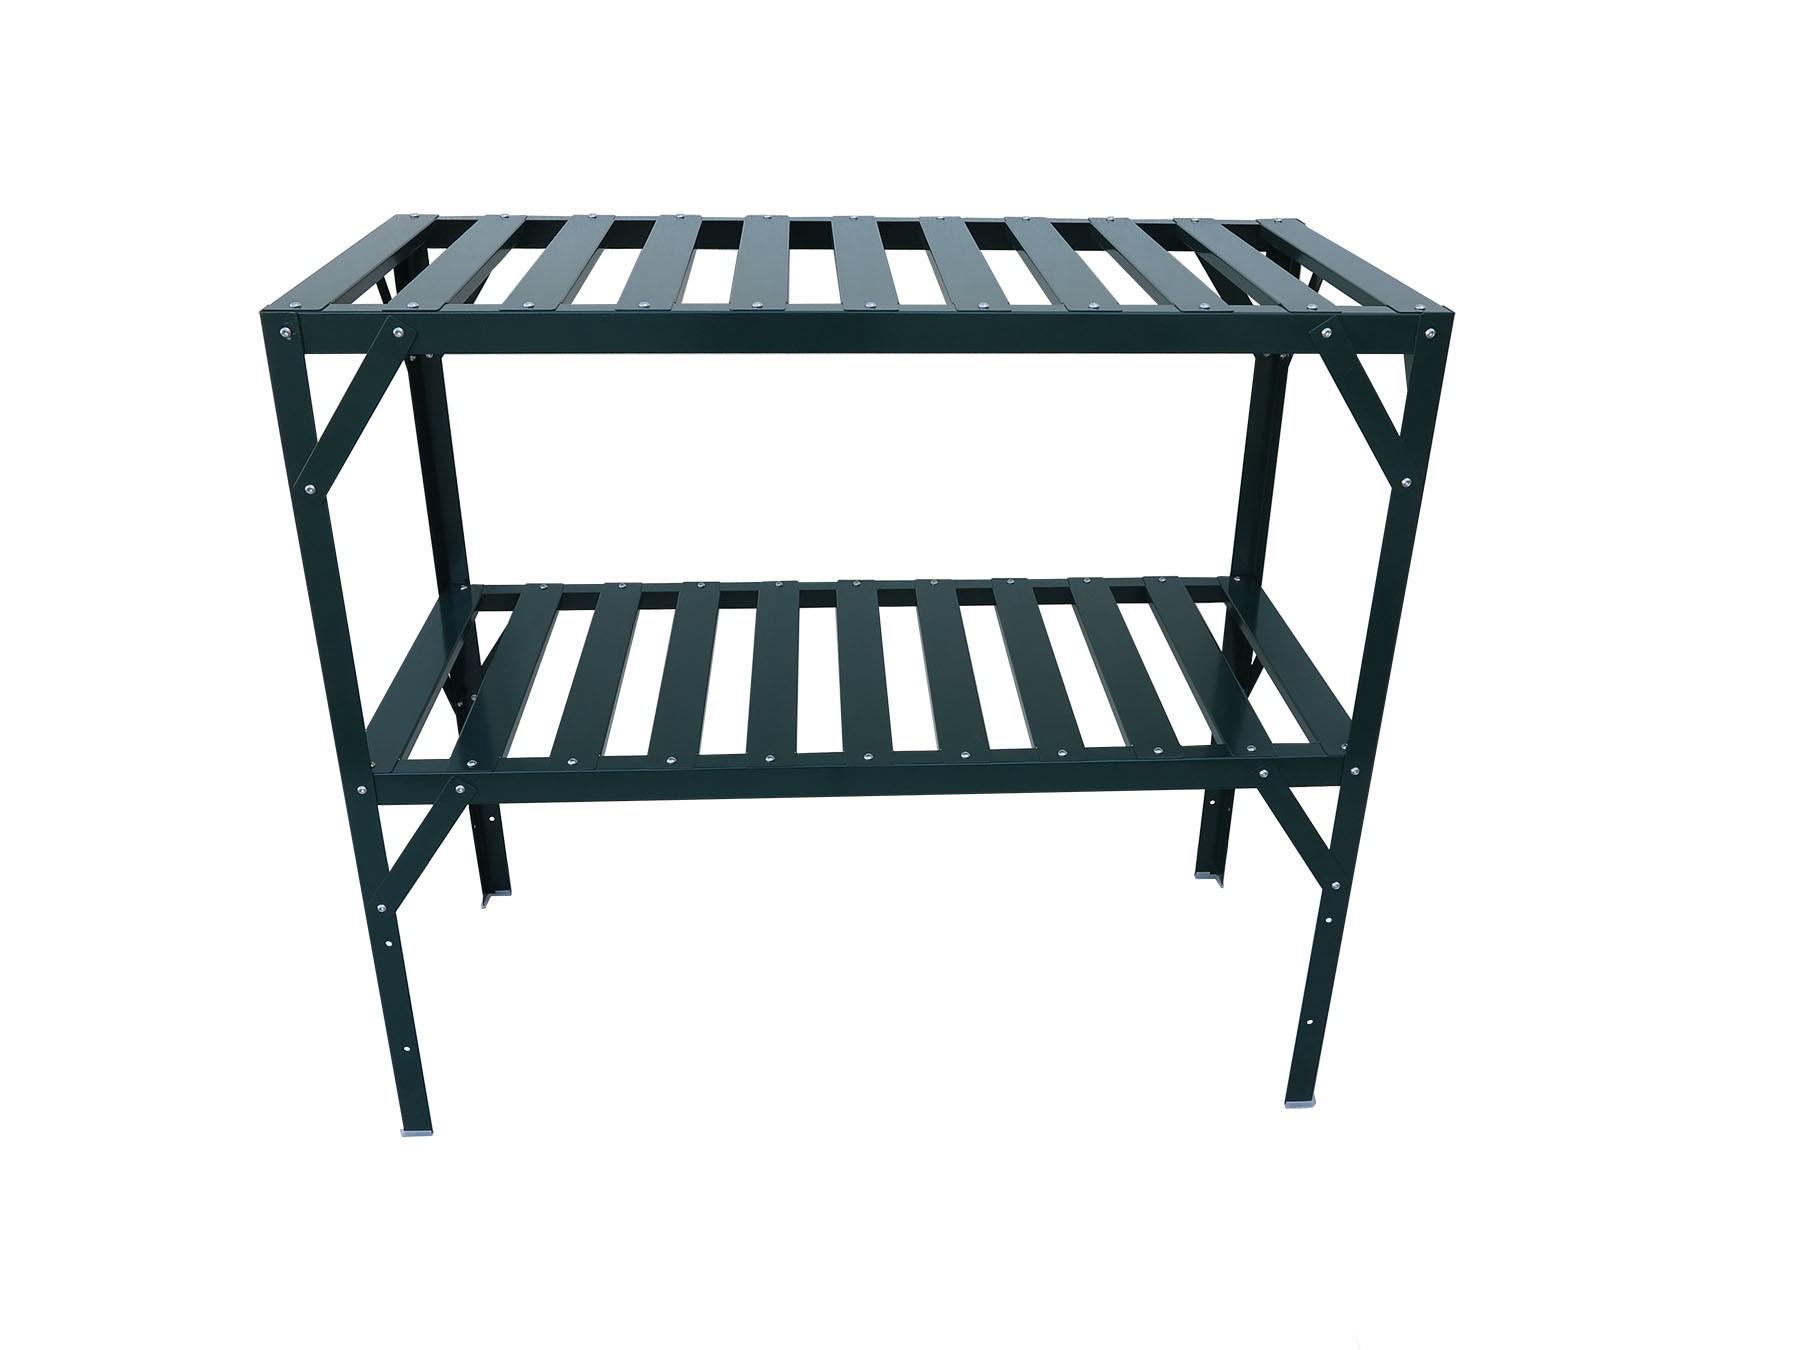 2017 Potting Bench with Adjustable Bottom Shelf